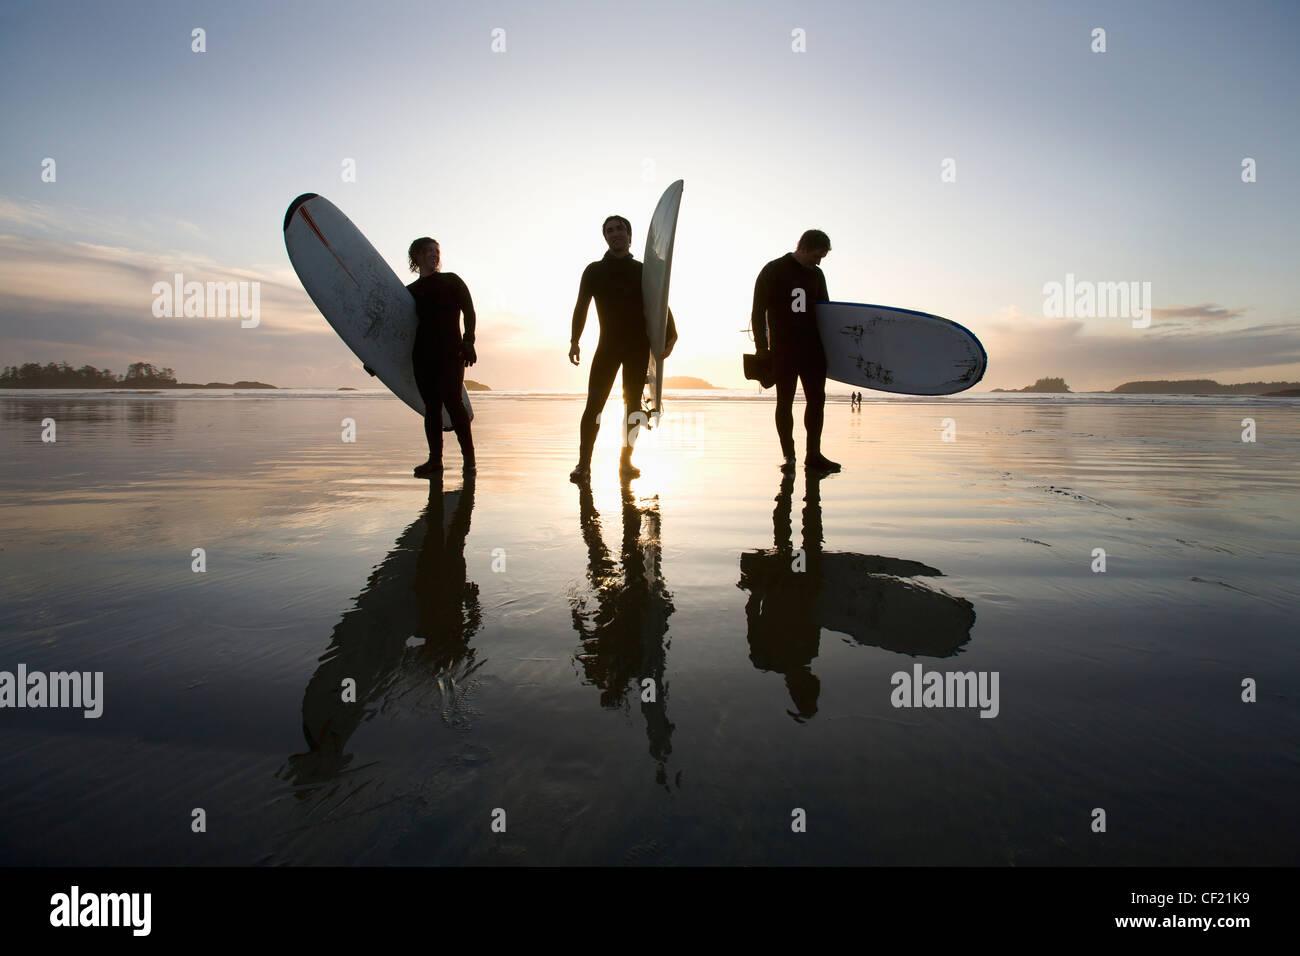 Silhouette der drei Surfer Surfboards tragen; Chesterman Beach Tofino Vancouver Island in British Columbia Kanada Stockbild